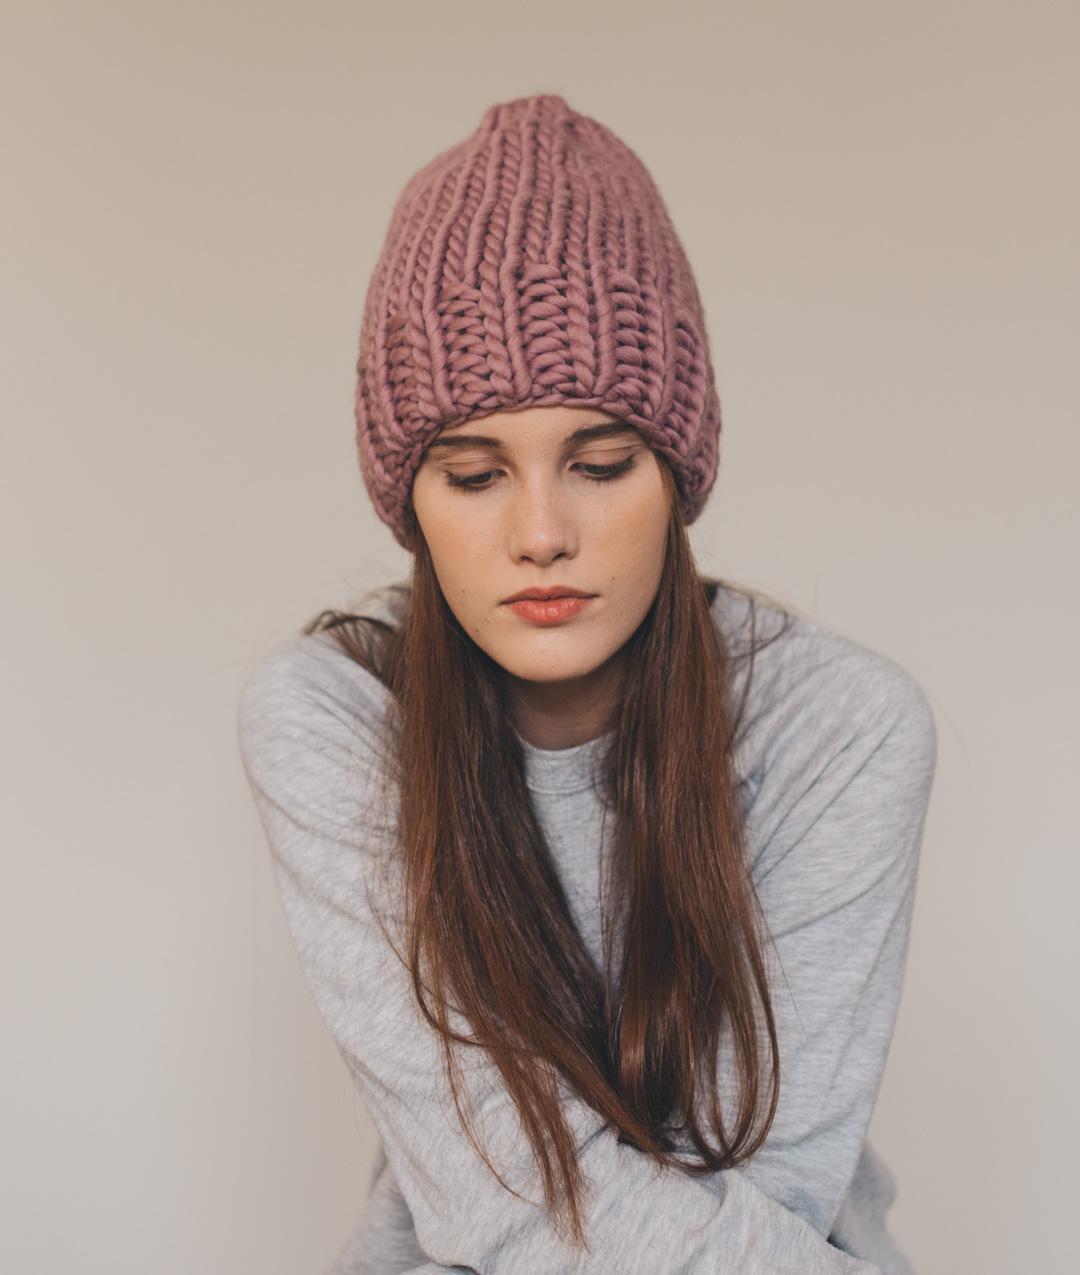 Hats and Beanies - Wool - Betta Beanie - 1